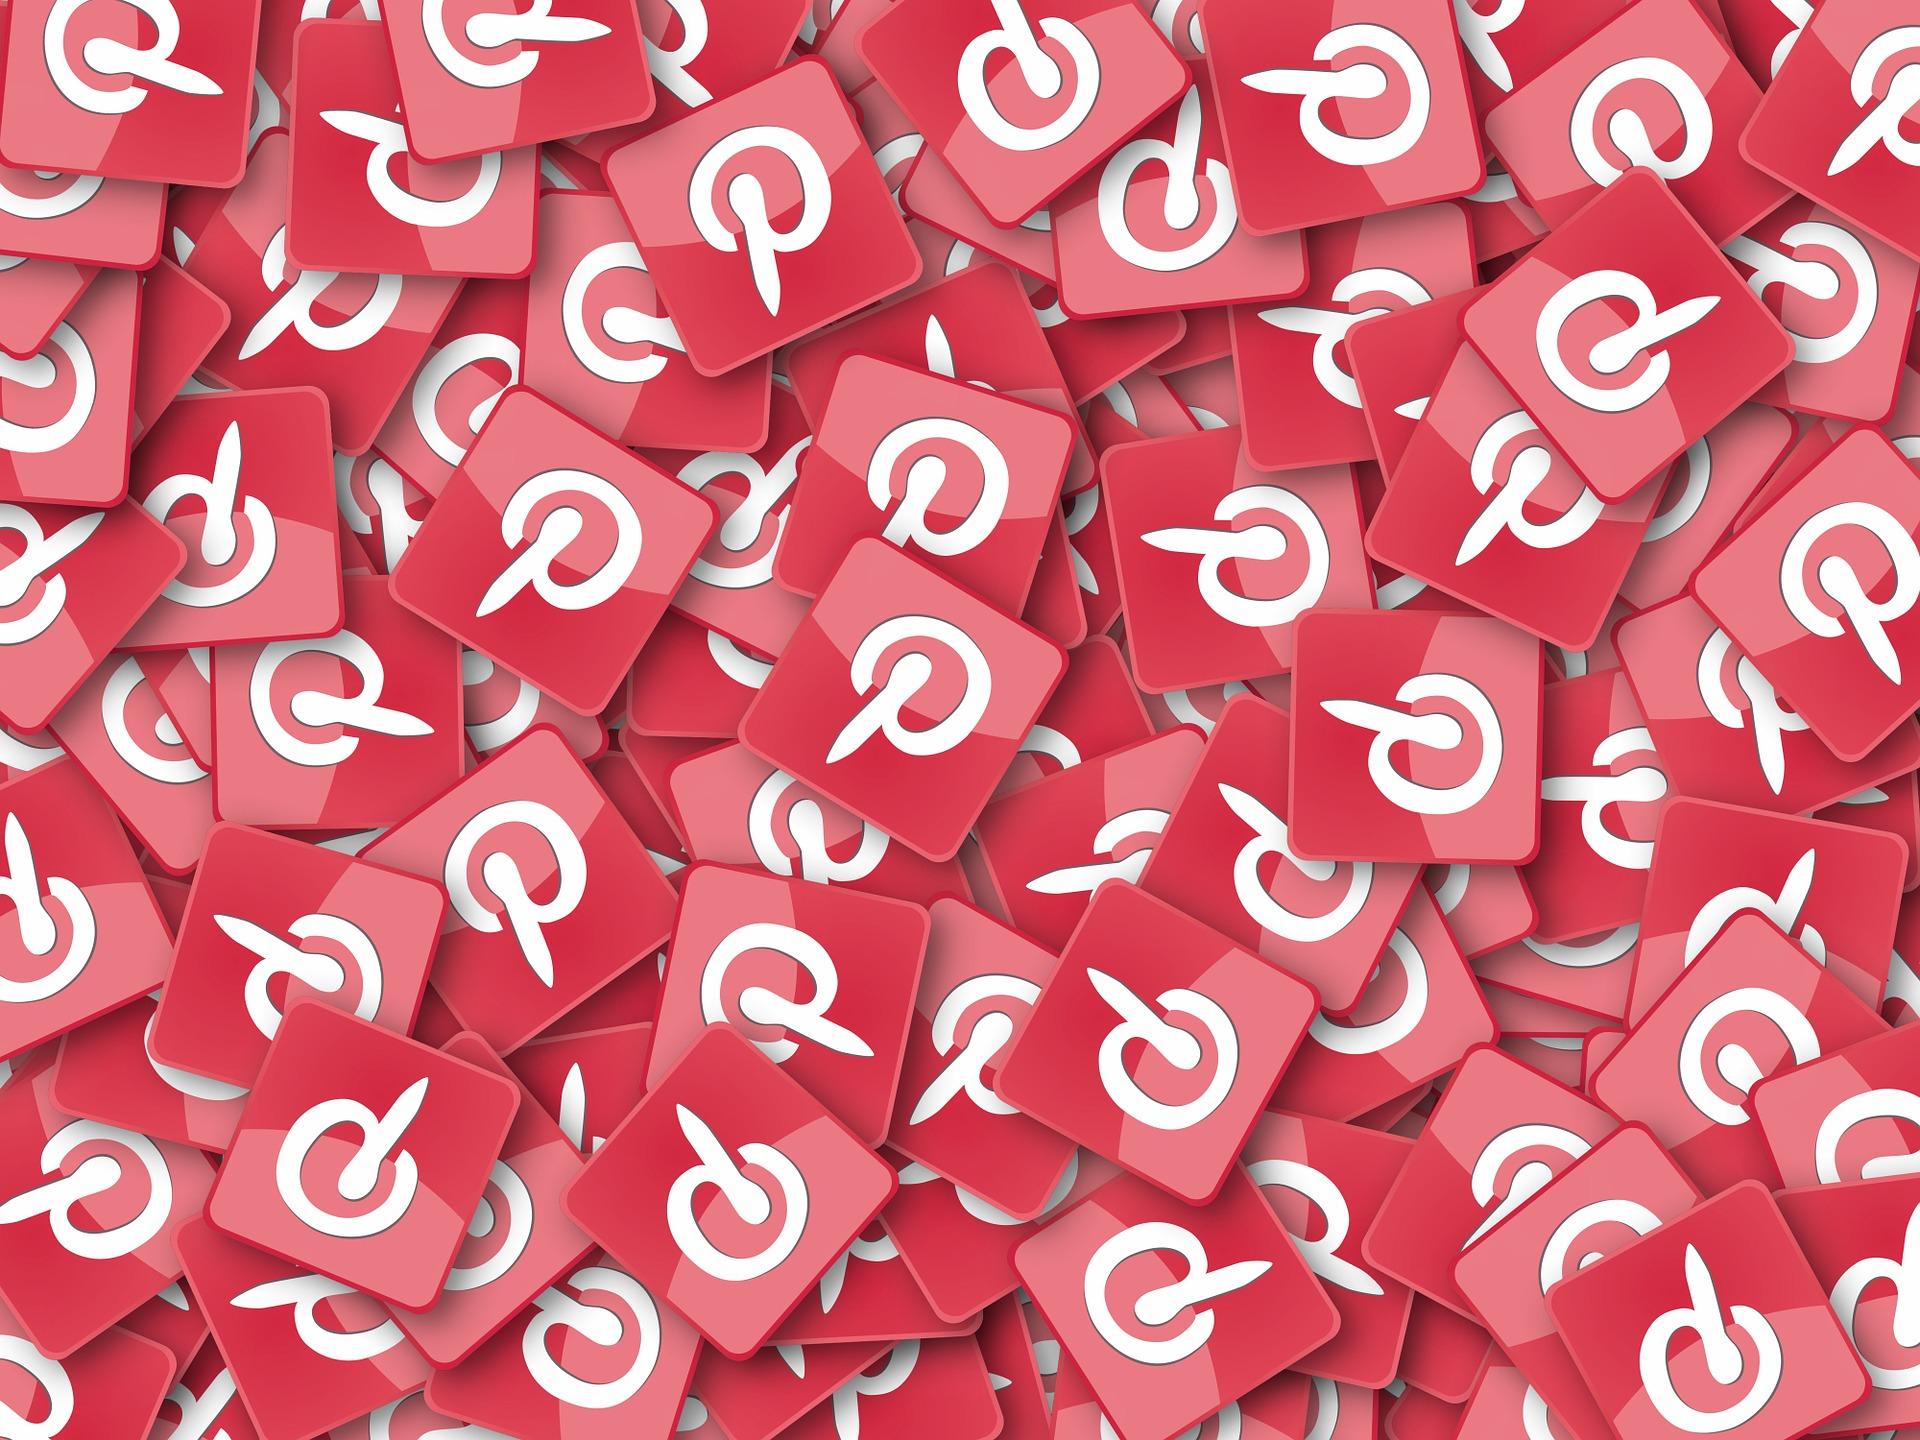 Pinterest stock, PINS stock, Social Media stocks